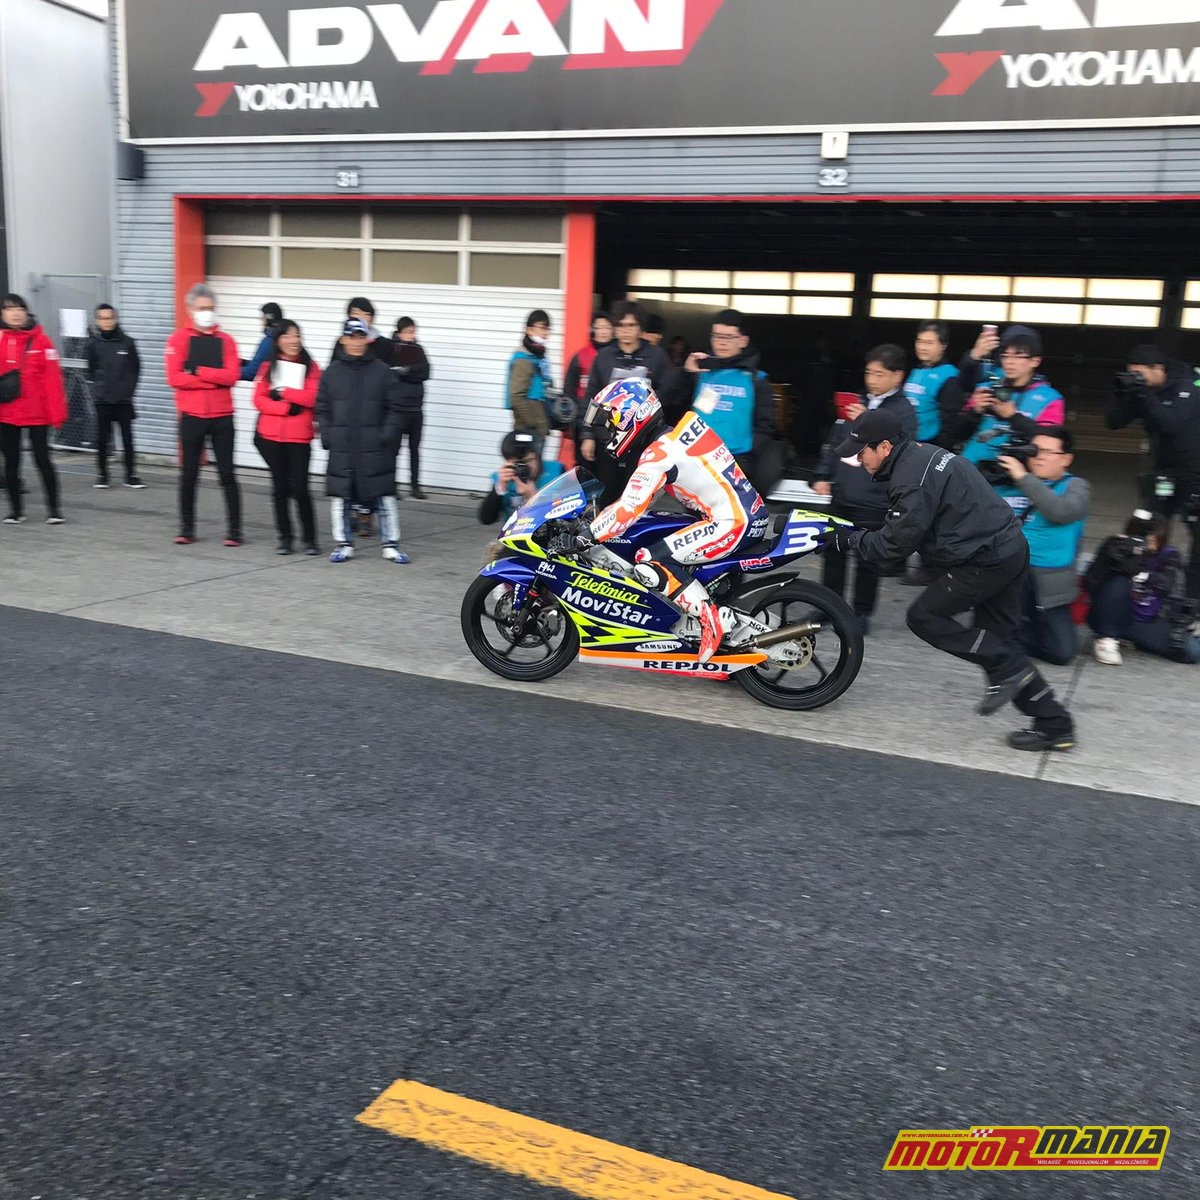 Dani Pedrosa Honda racing thanks day (2)